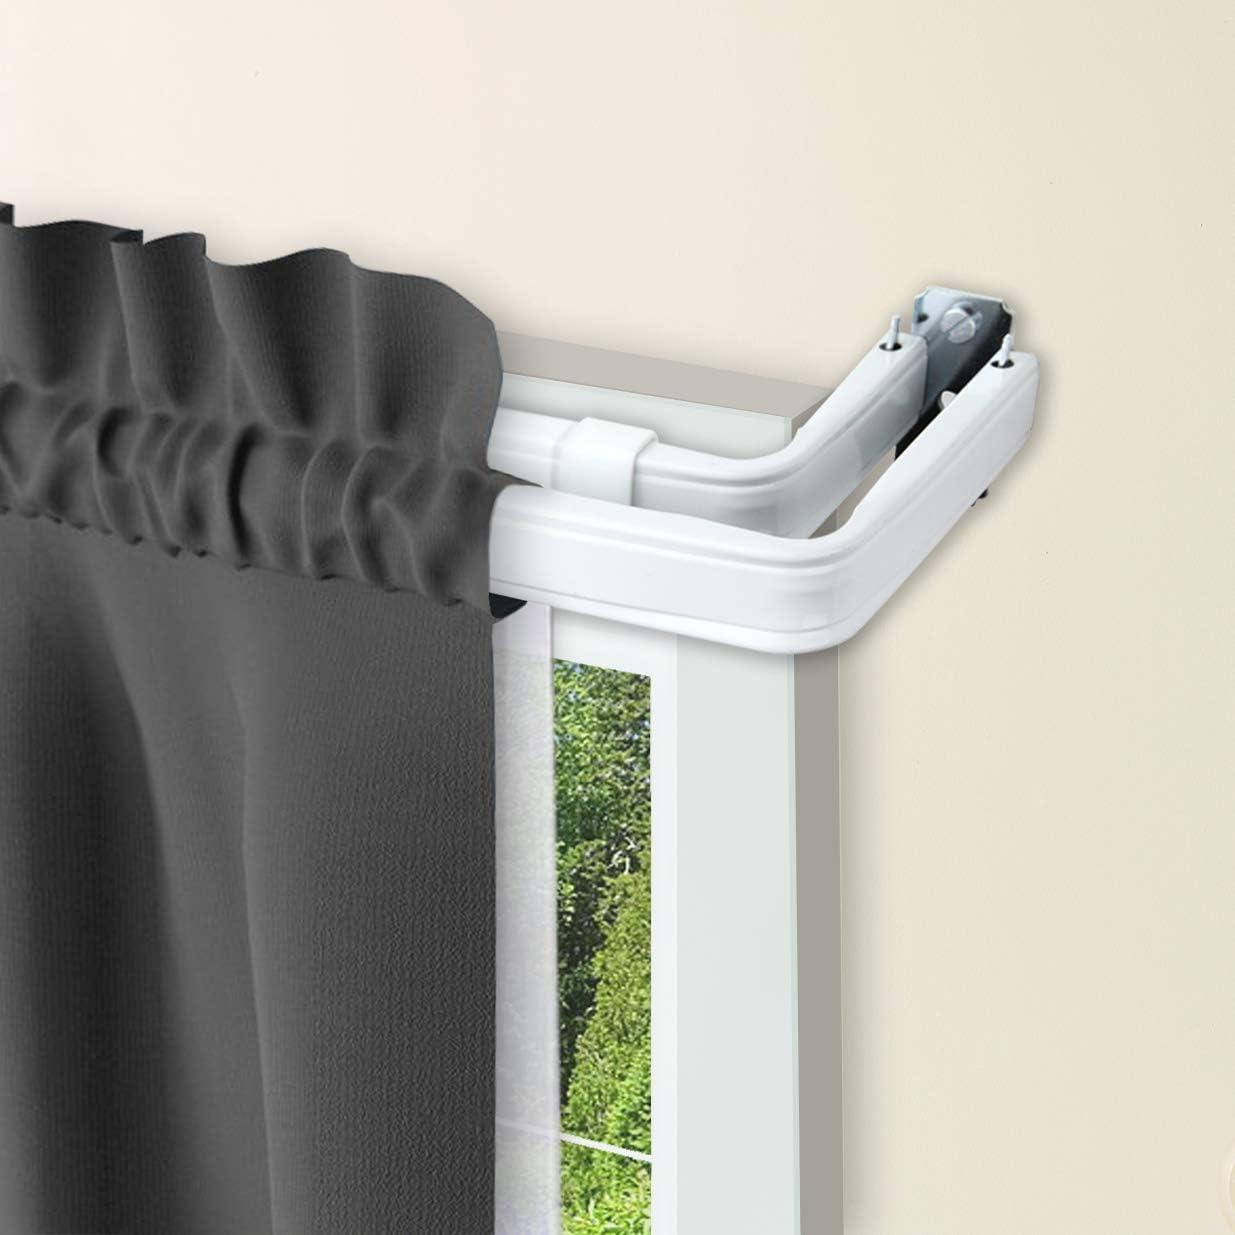 Rod Desyne Lockseam Double Curtain White inch Max 57% OFF 84-120 latest